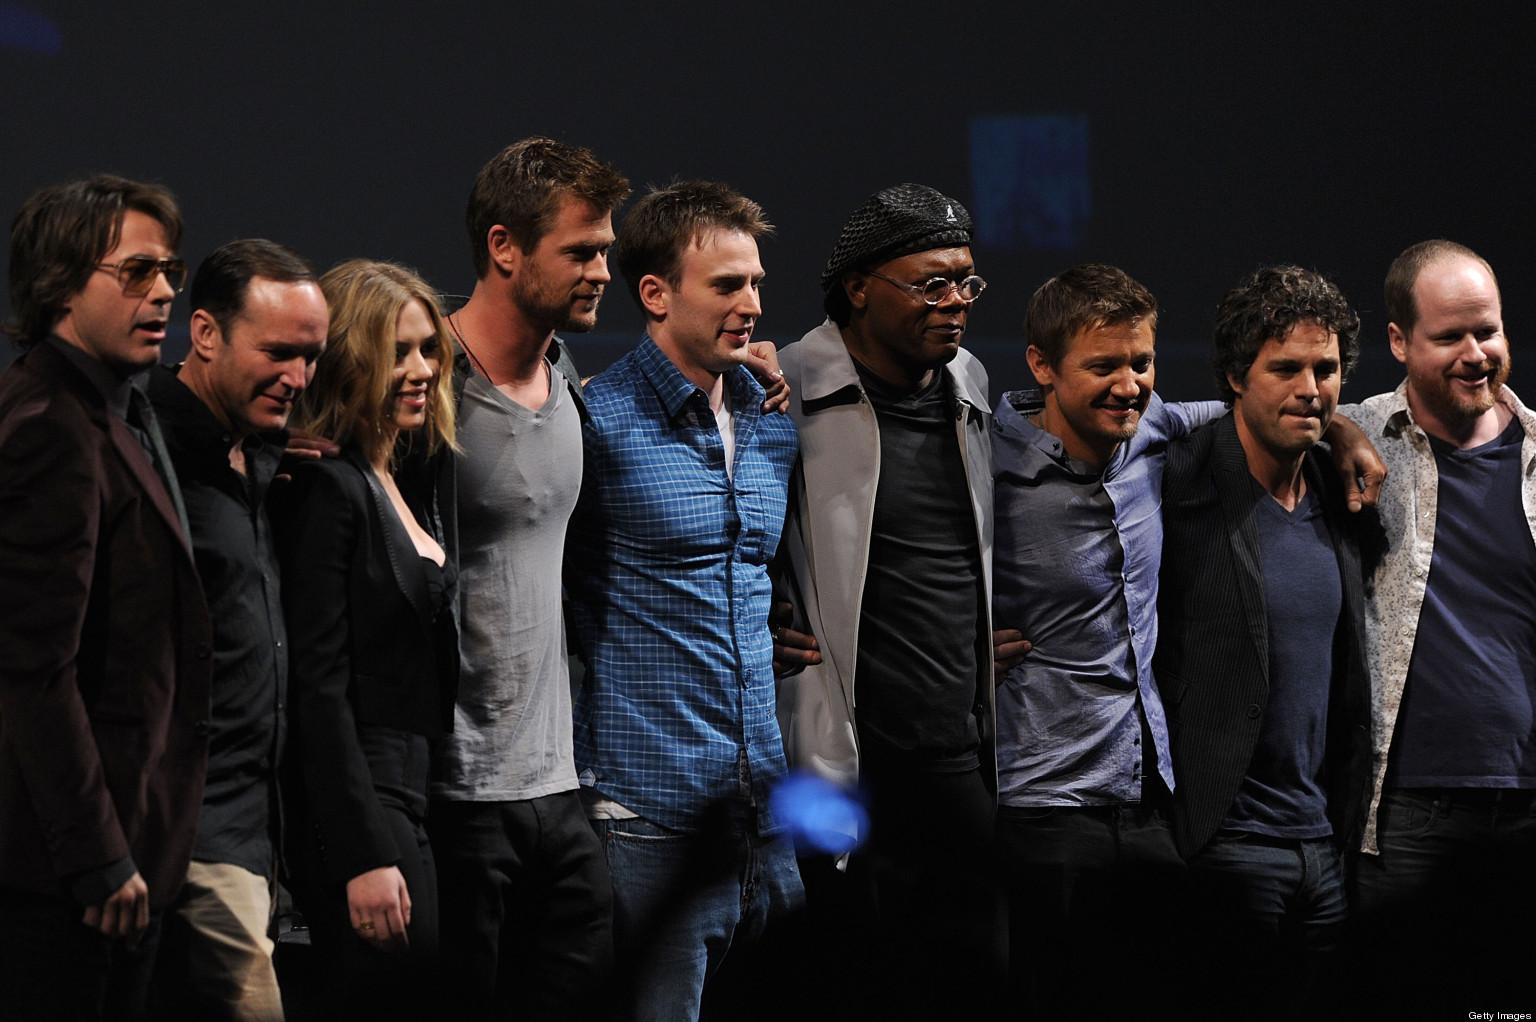 The Avengers: 'The Avengers' At Oscars: Robert Downey Jr. & Cast Heading